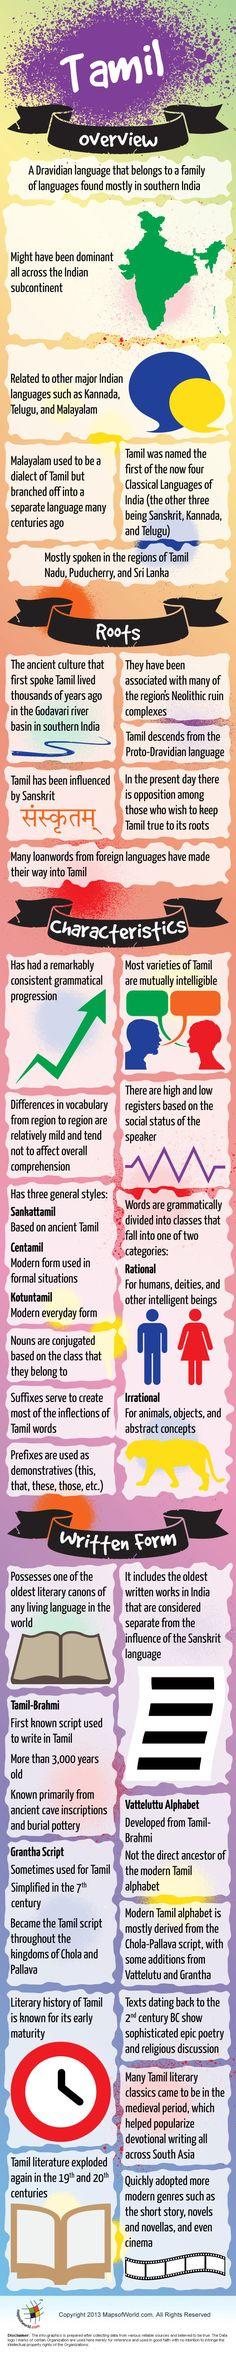 Infographic of Tamil Language.